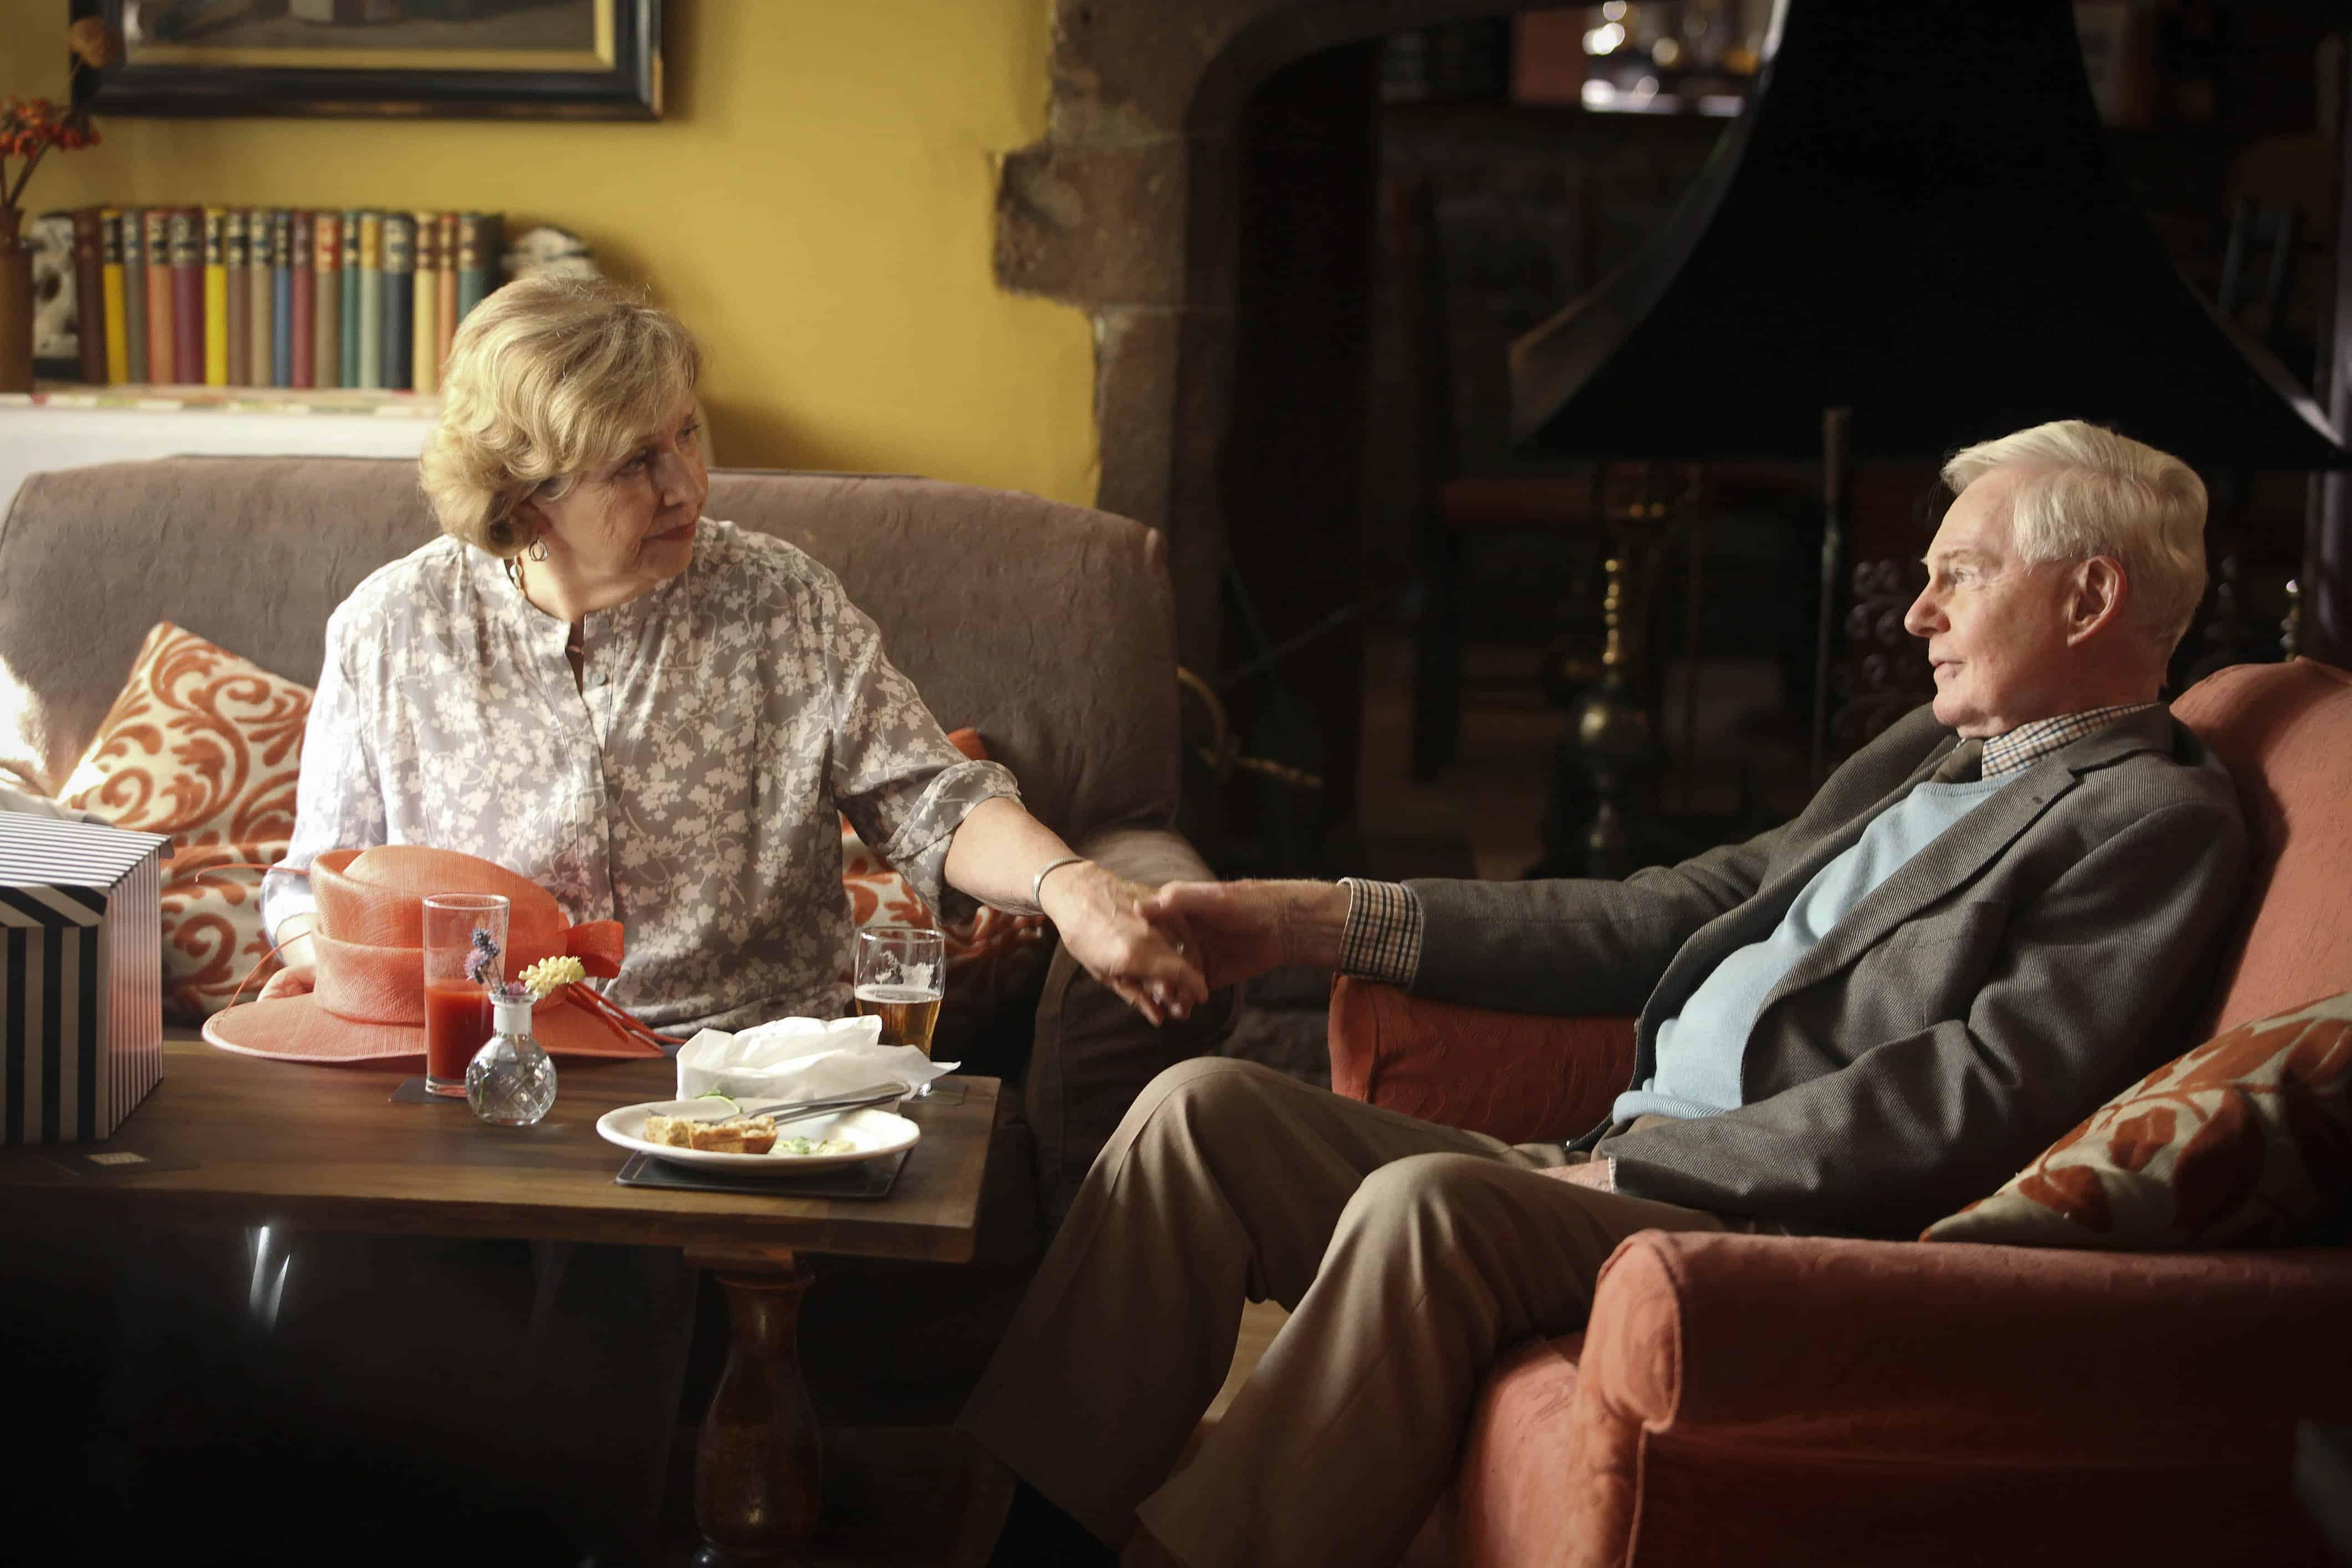 Last-Tango-in-Halifax-tercera-temporada-primer-episodio-1 'Last Tango in Halifax' lanza las primeras fotos de la tercera temporada